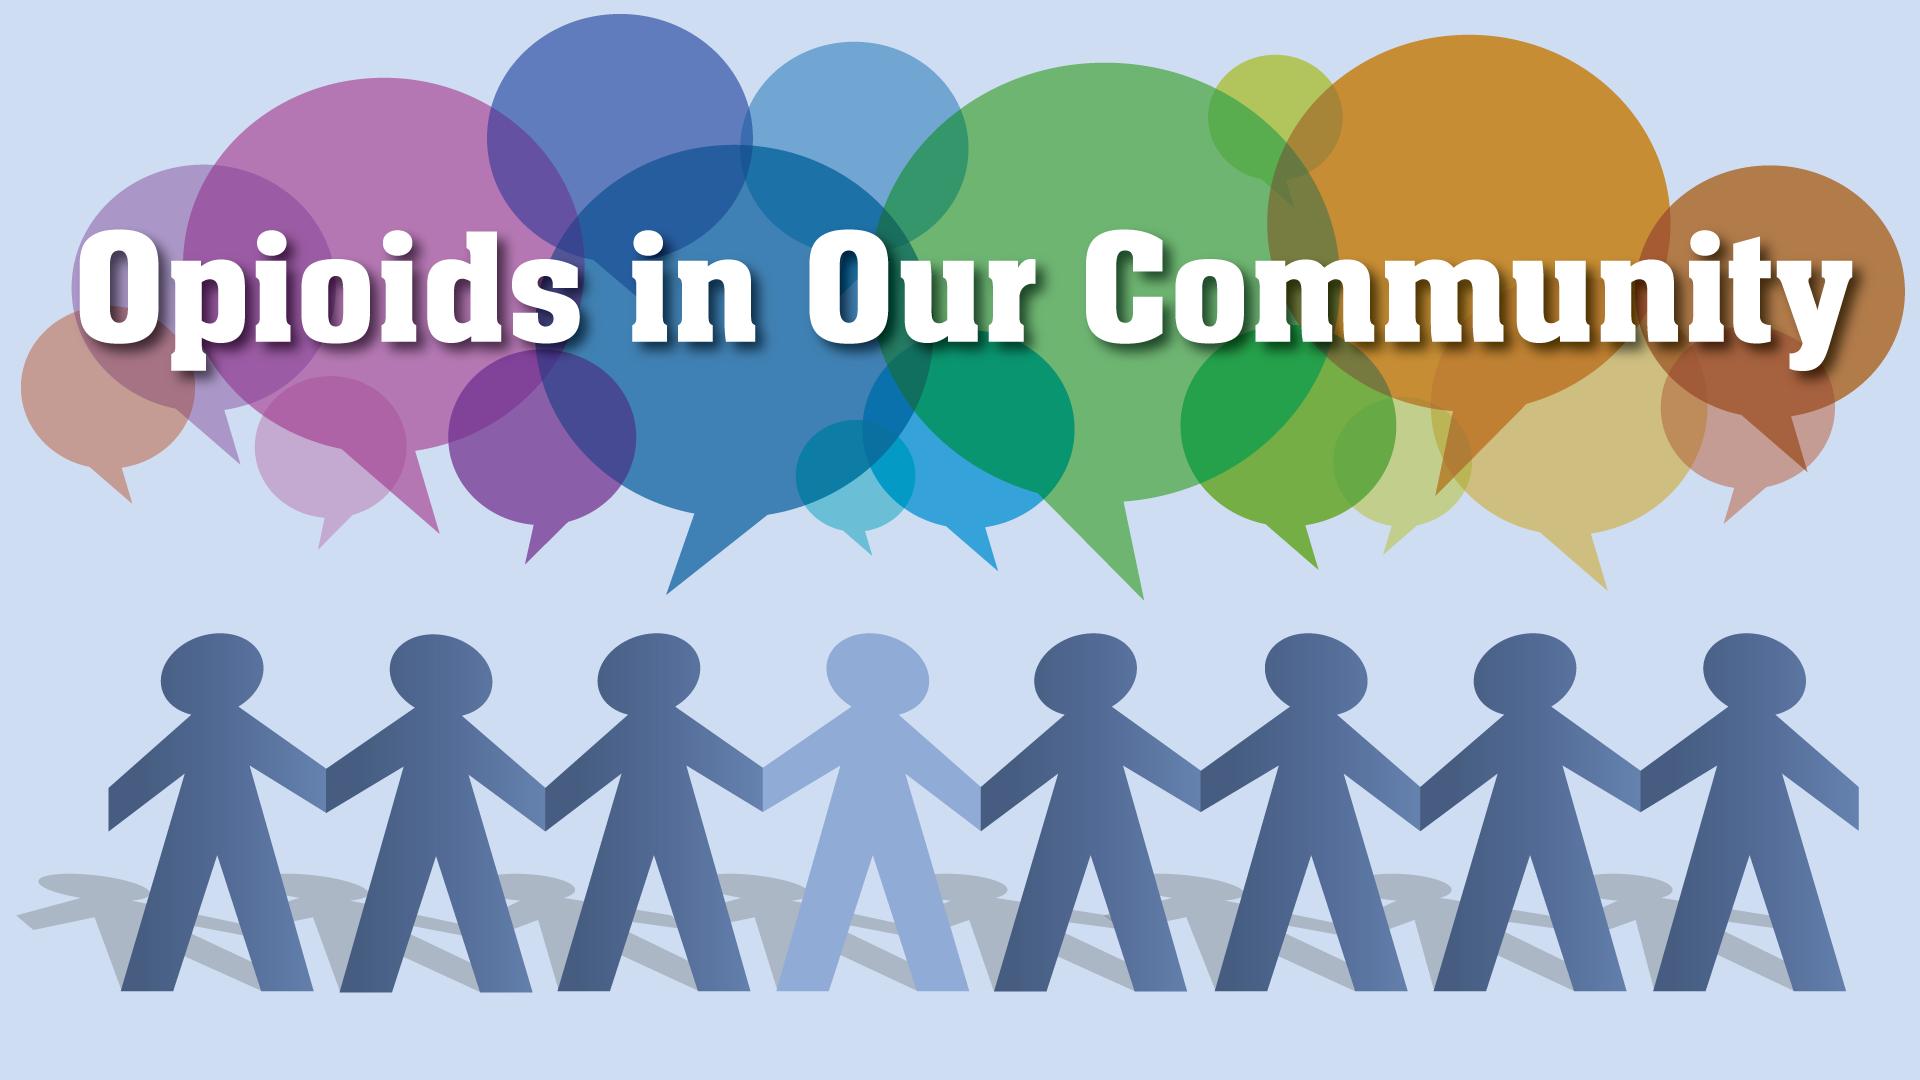 Opioids in Our Community   High School   PBS LearningMedia